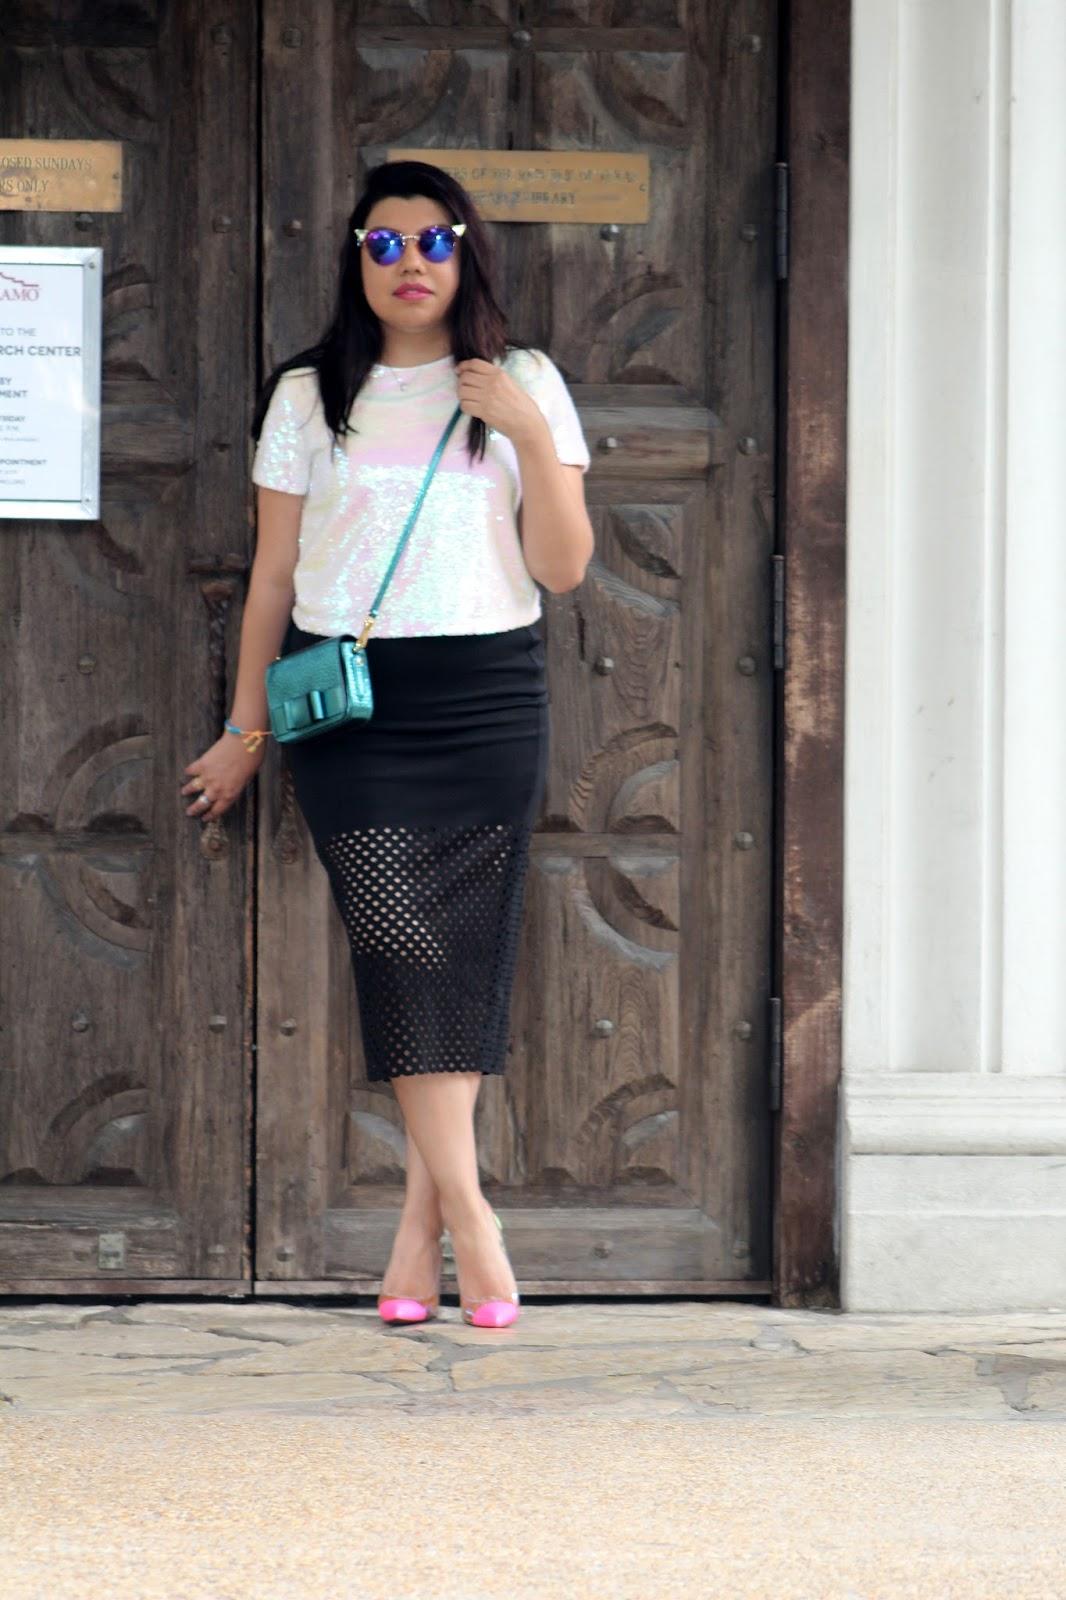 The Neon Factor fashion blog